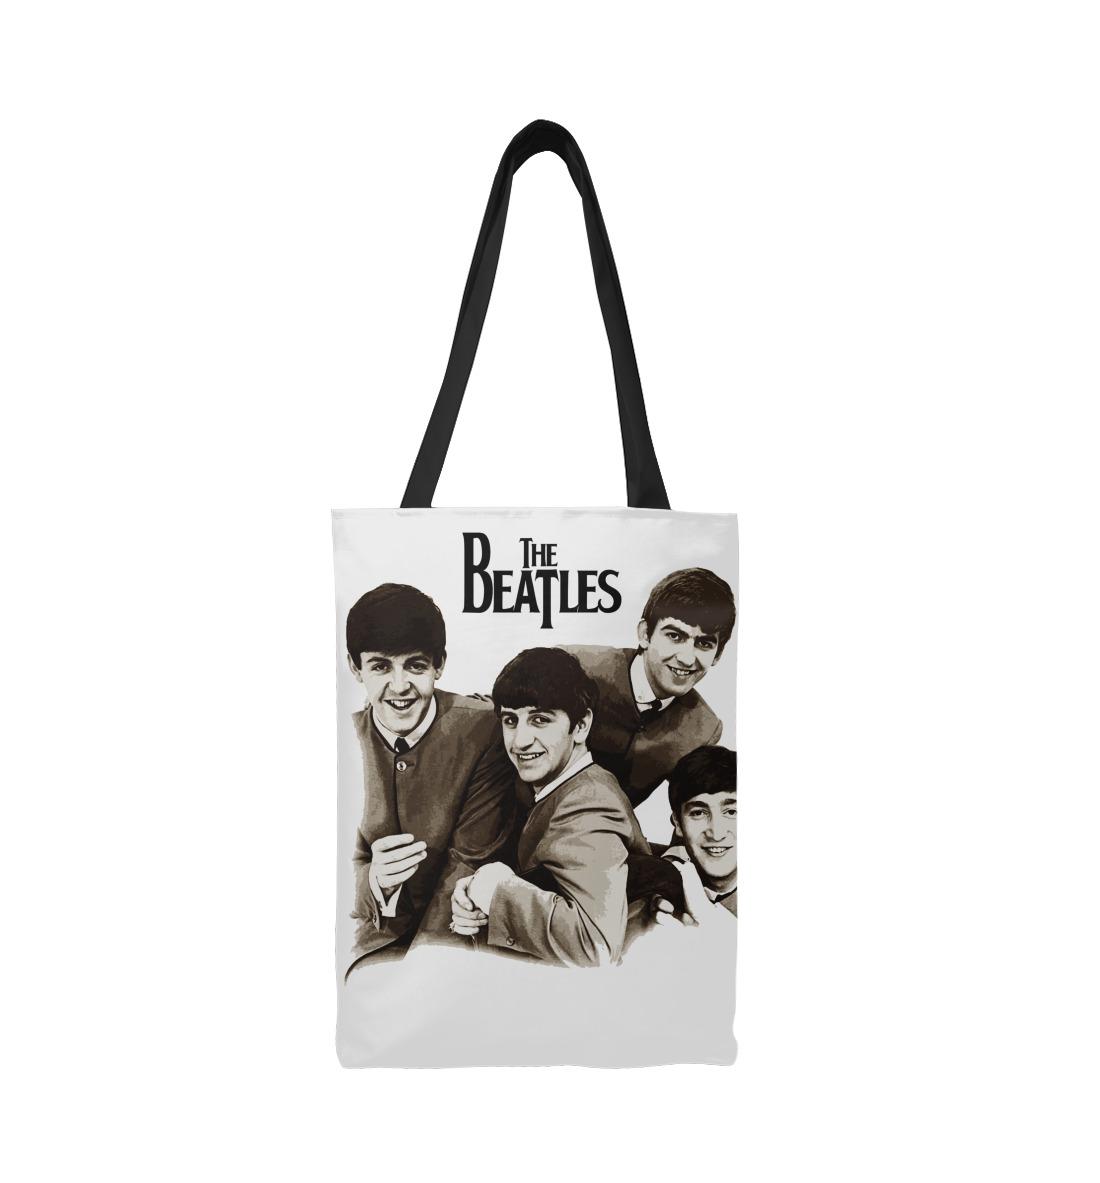 The Beatles the beatles глазами звезд московского блюза 2019 10 11t20 30